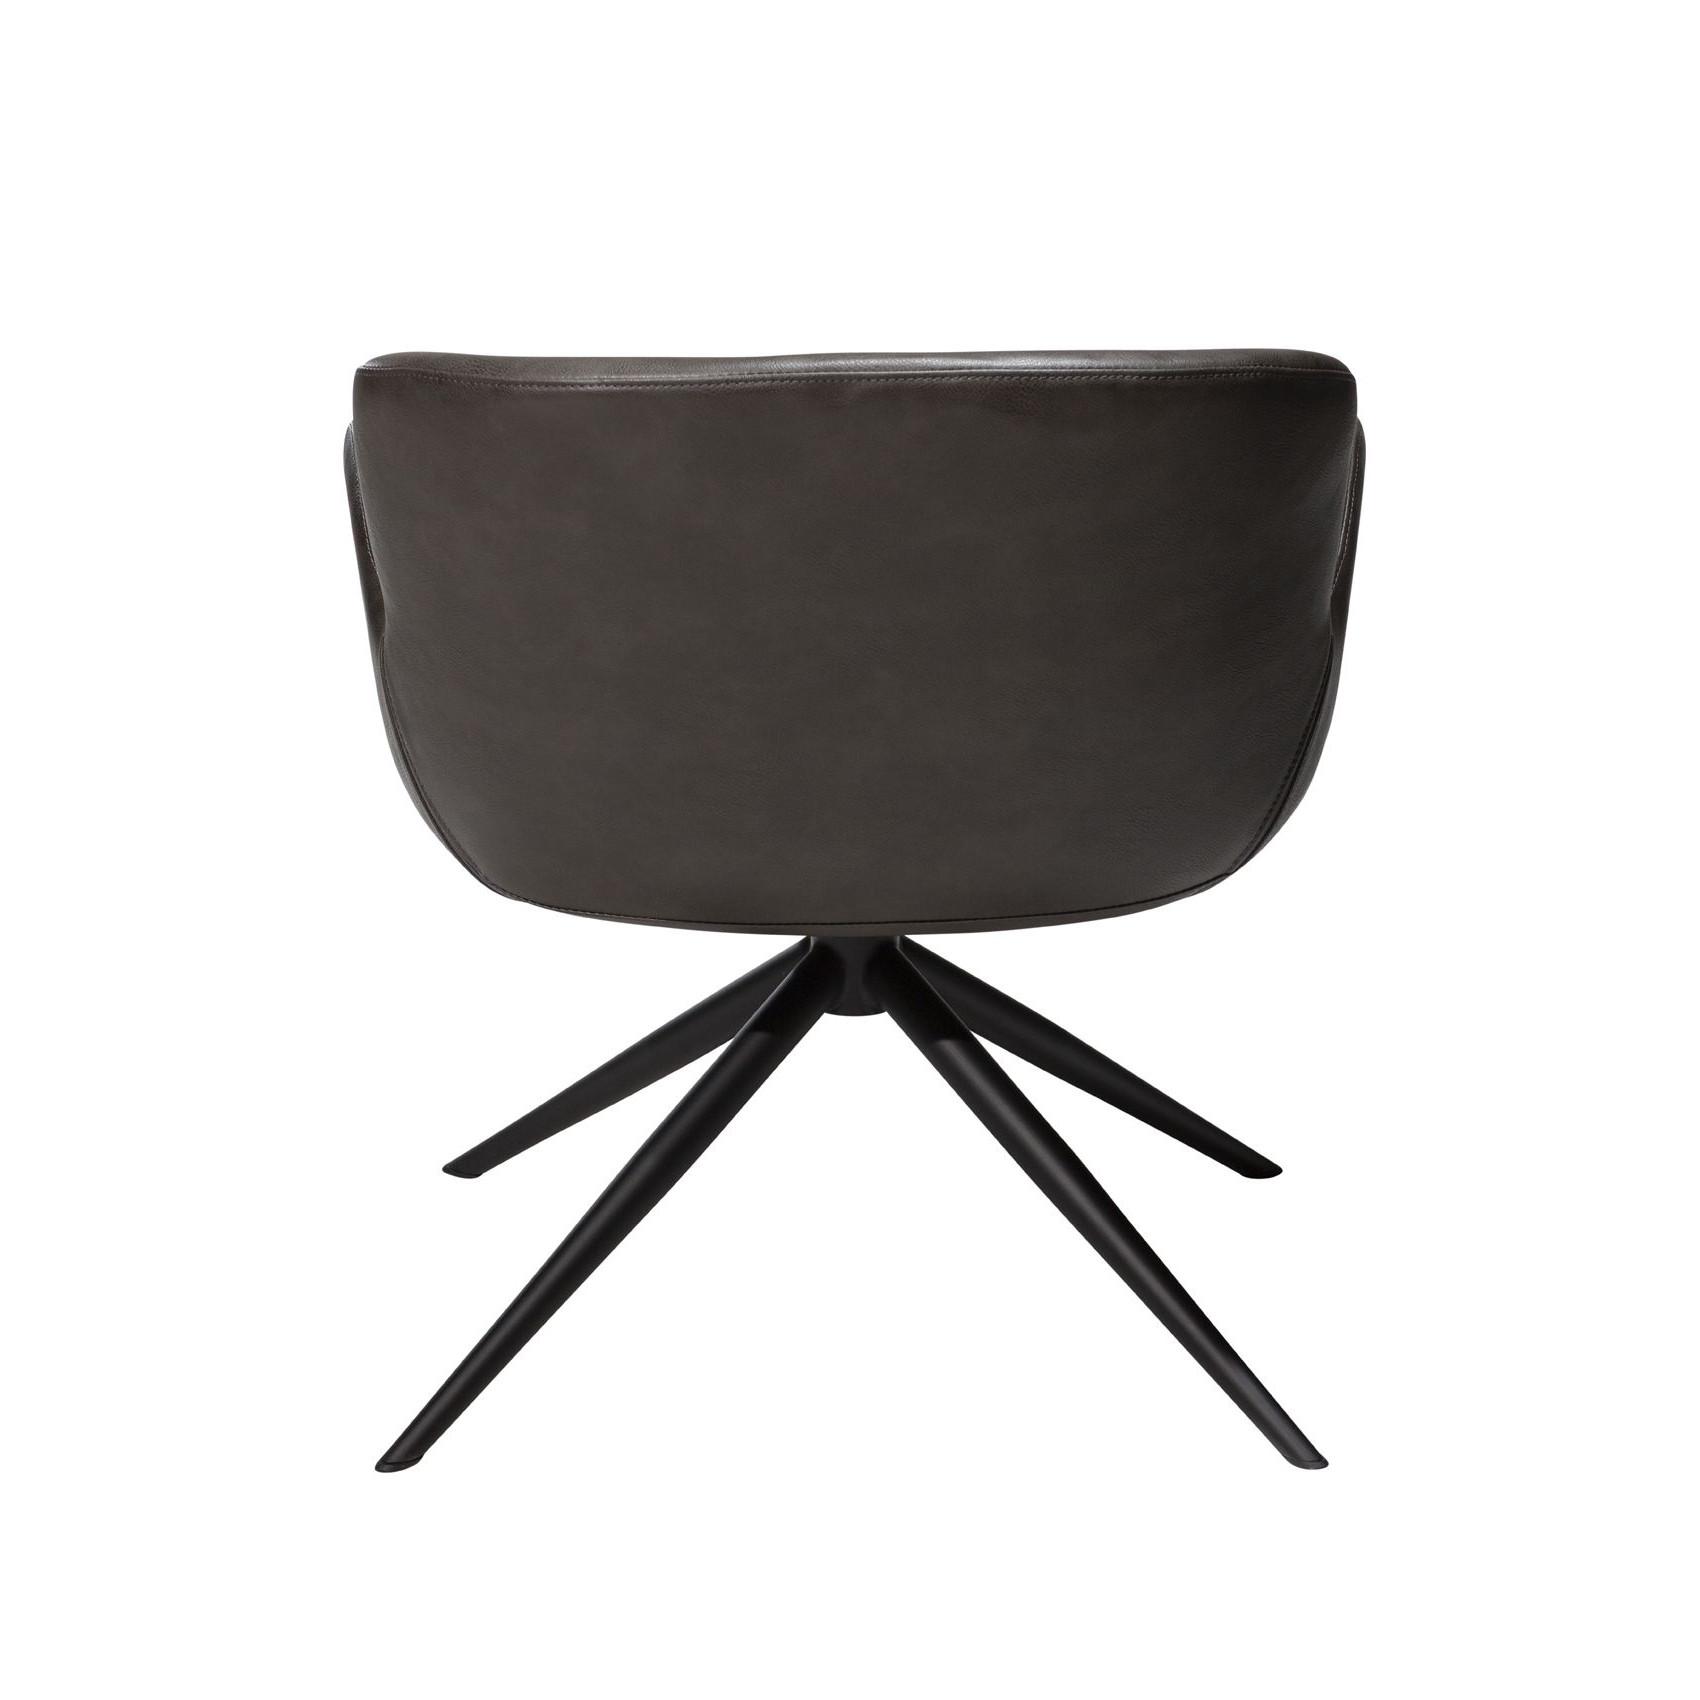 Lounge Chair Gaia | Art. Leder / Vintage Grau